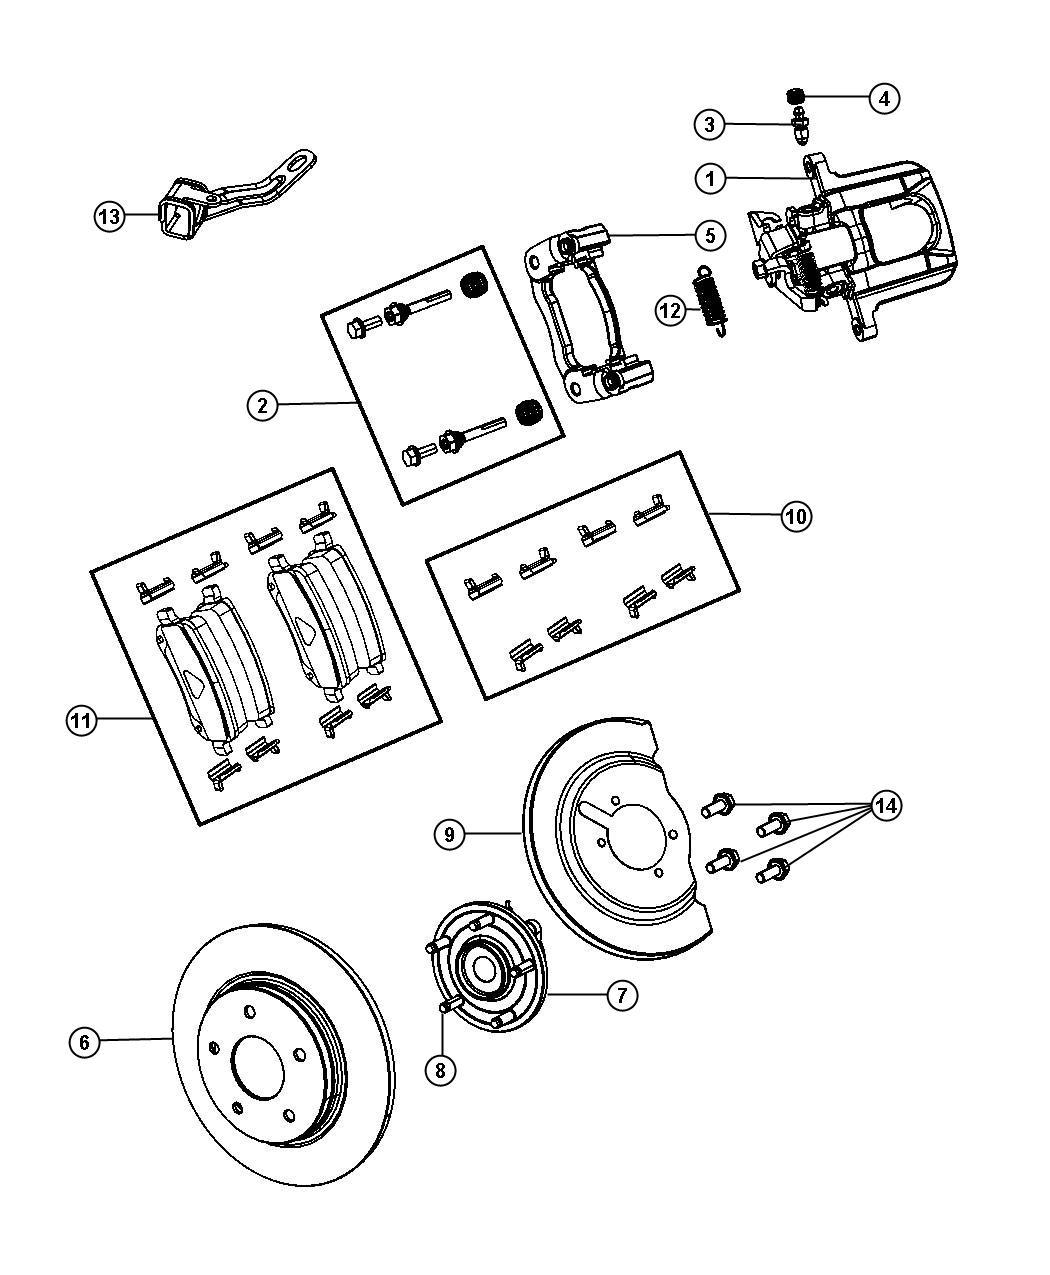 Dodge Used For Hub And Bearing Brake